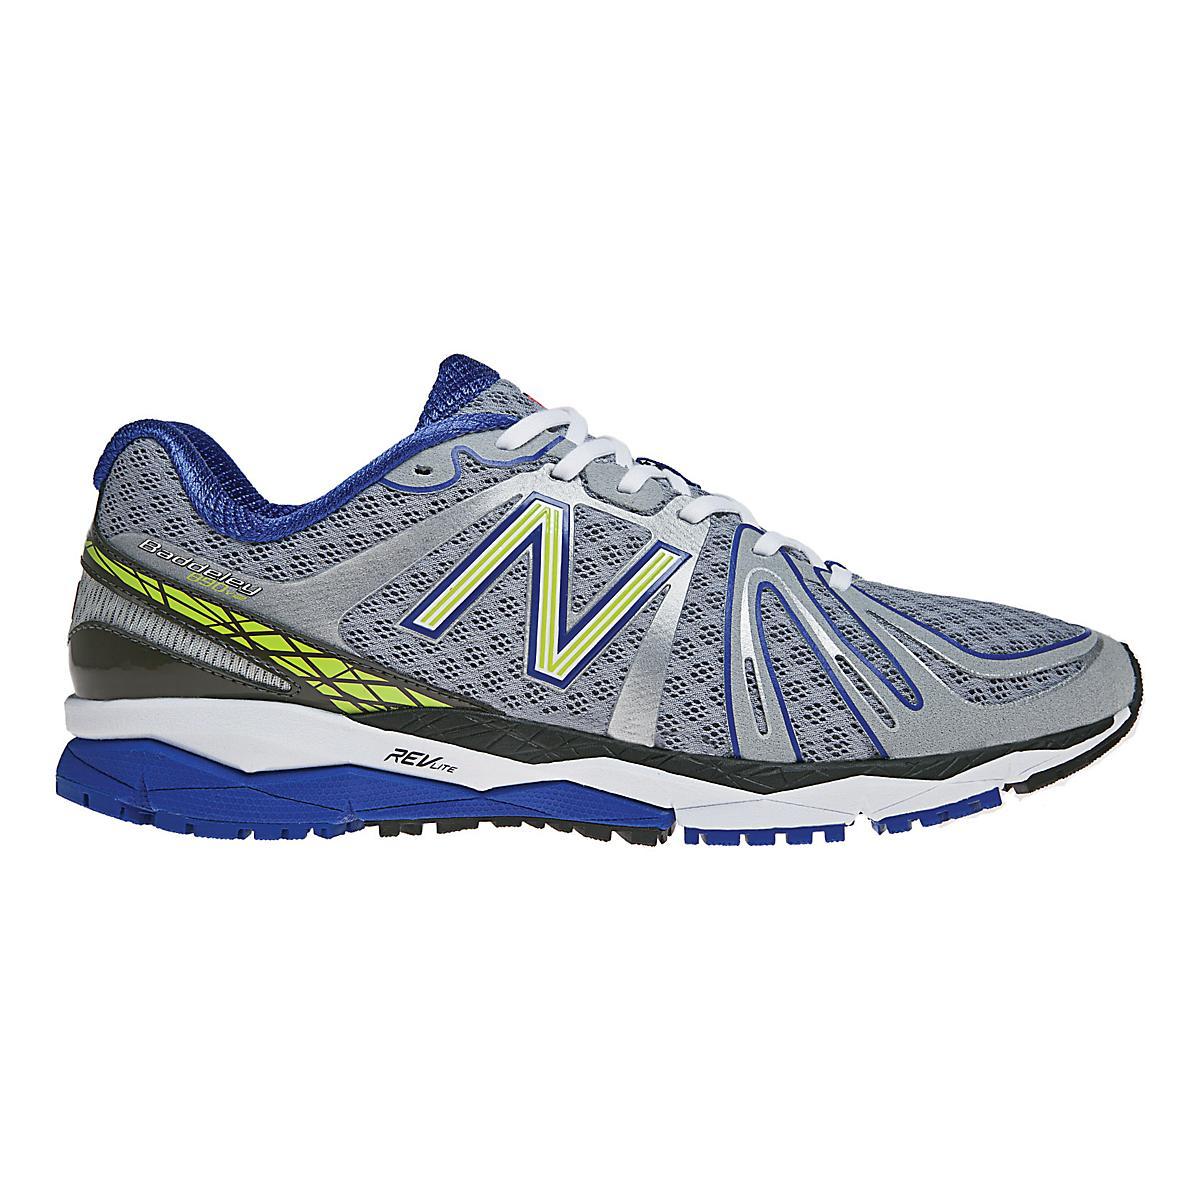 16475ab5ad32 Mens New Balance 890v2 Running Shoe at Road Runner Sports